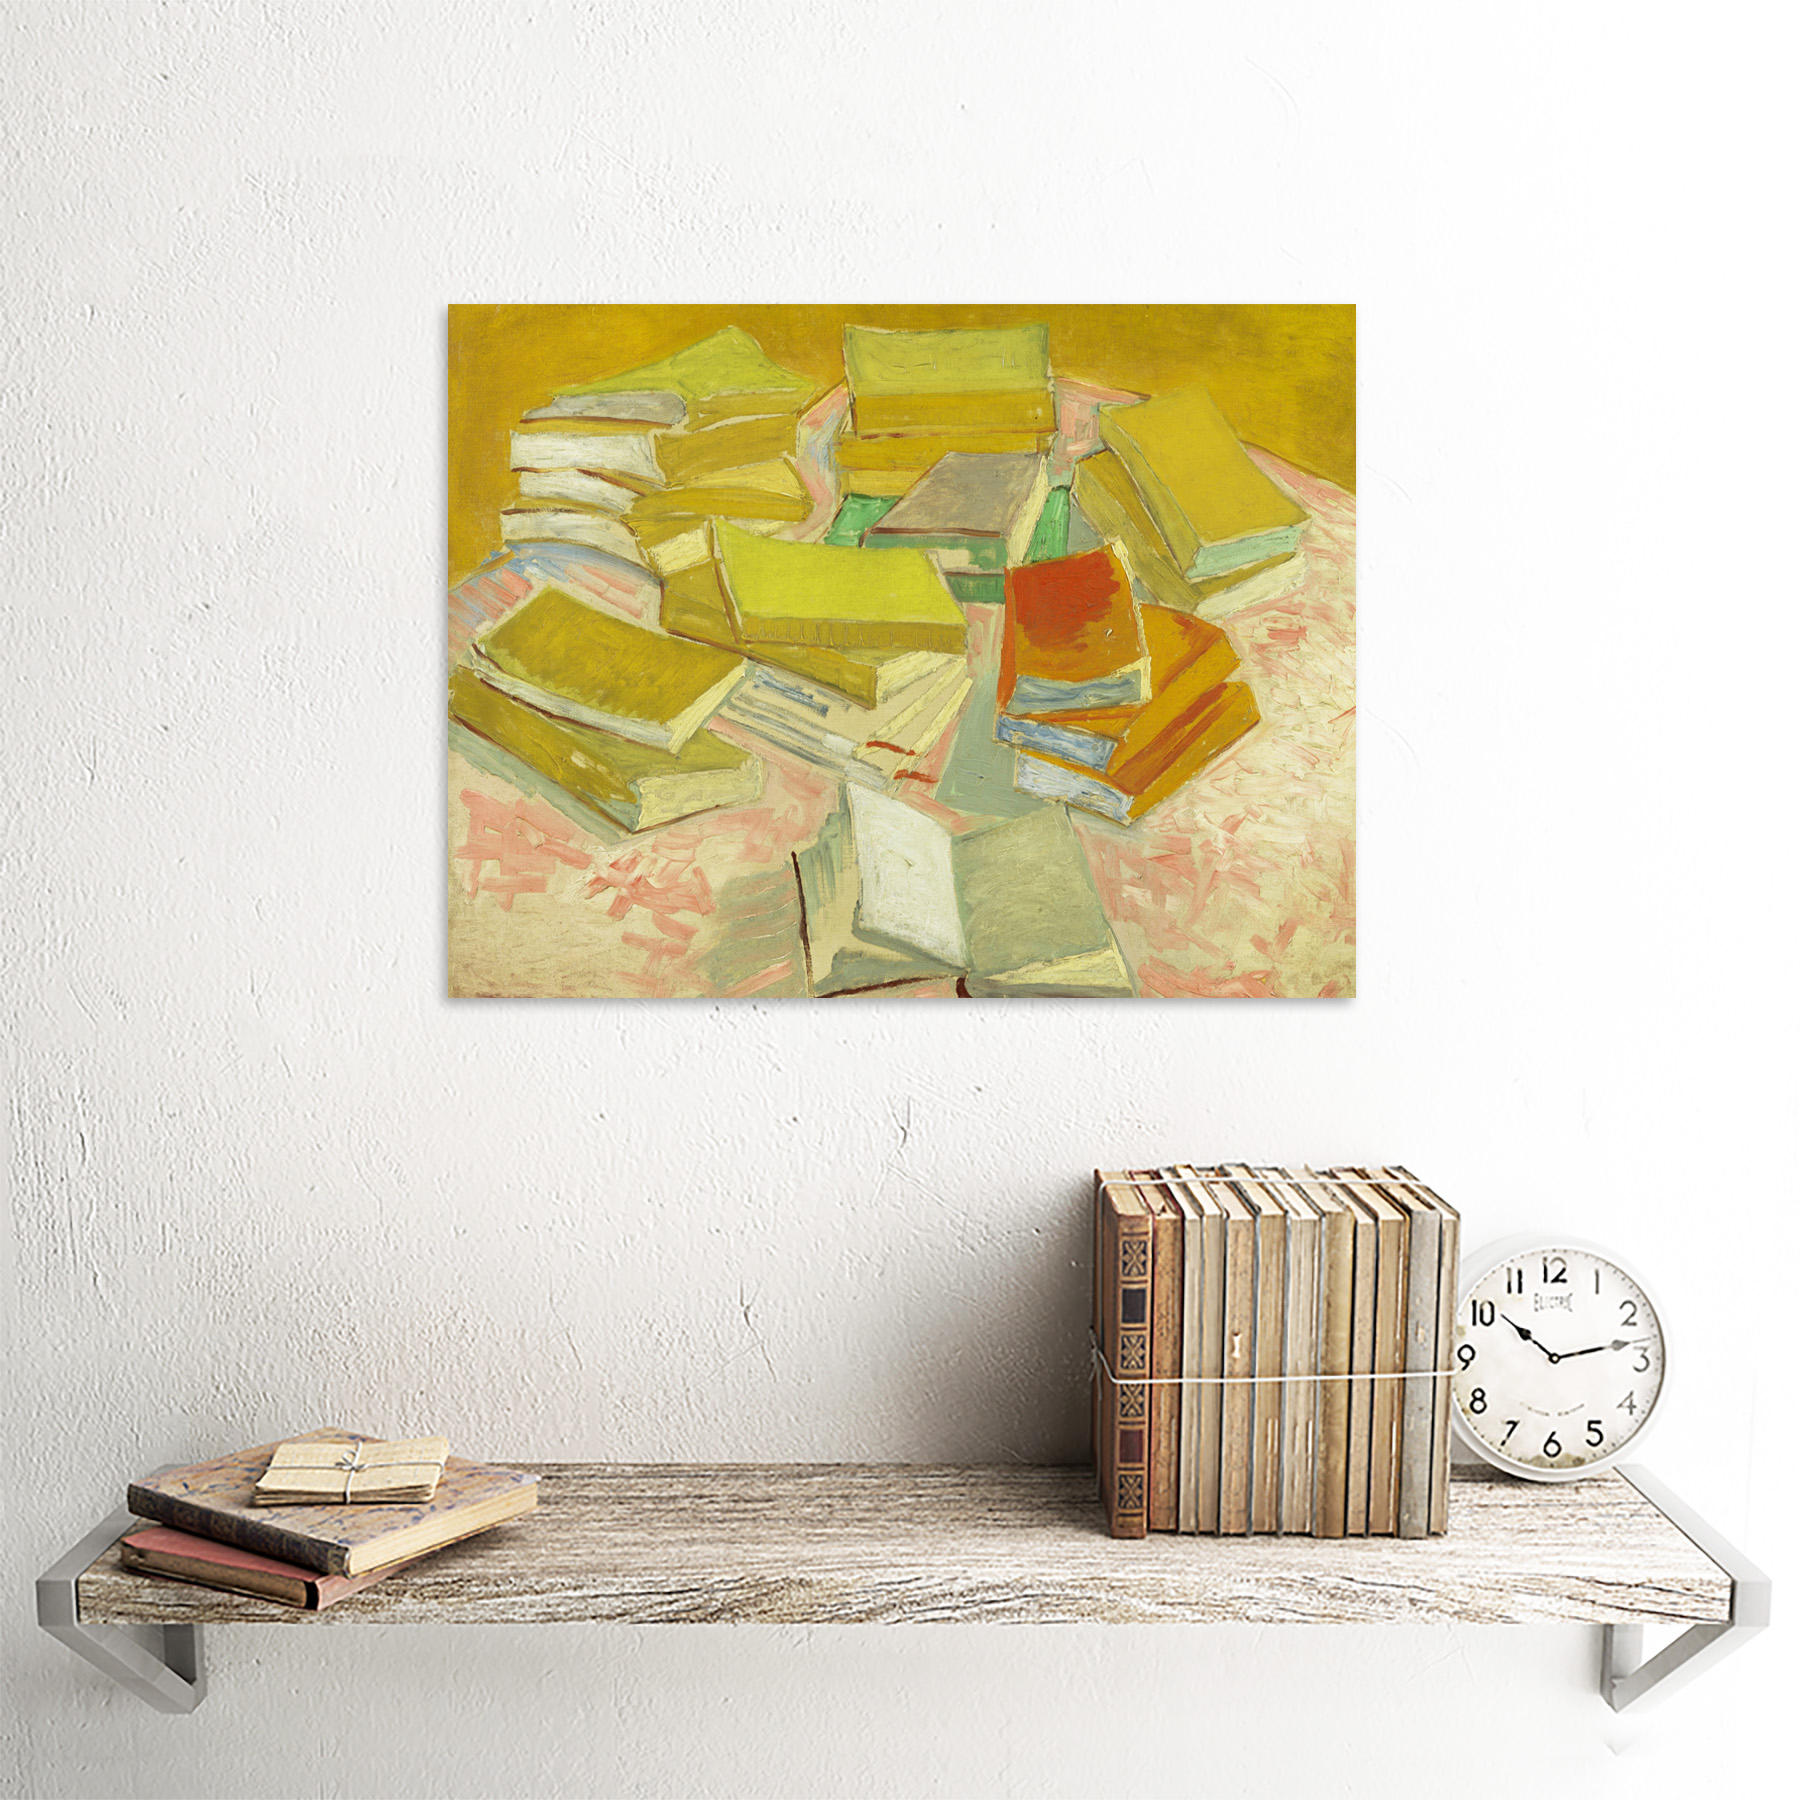 thumbnail 23 - Vincent-Van-Gogh-Piles-Of-French-Novels-Art-Print-Framed-12x16